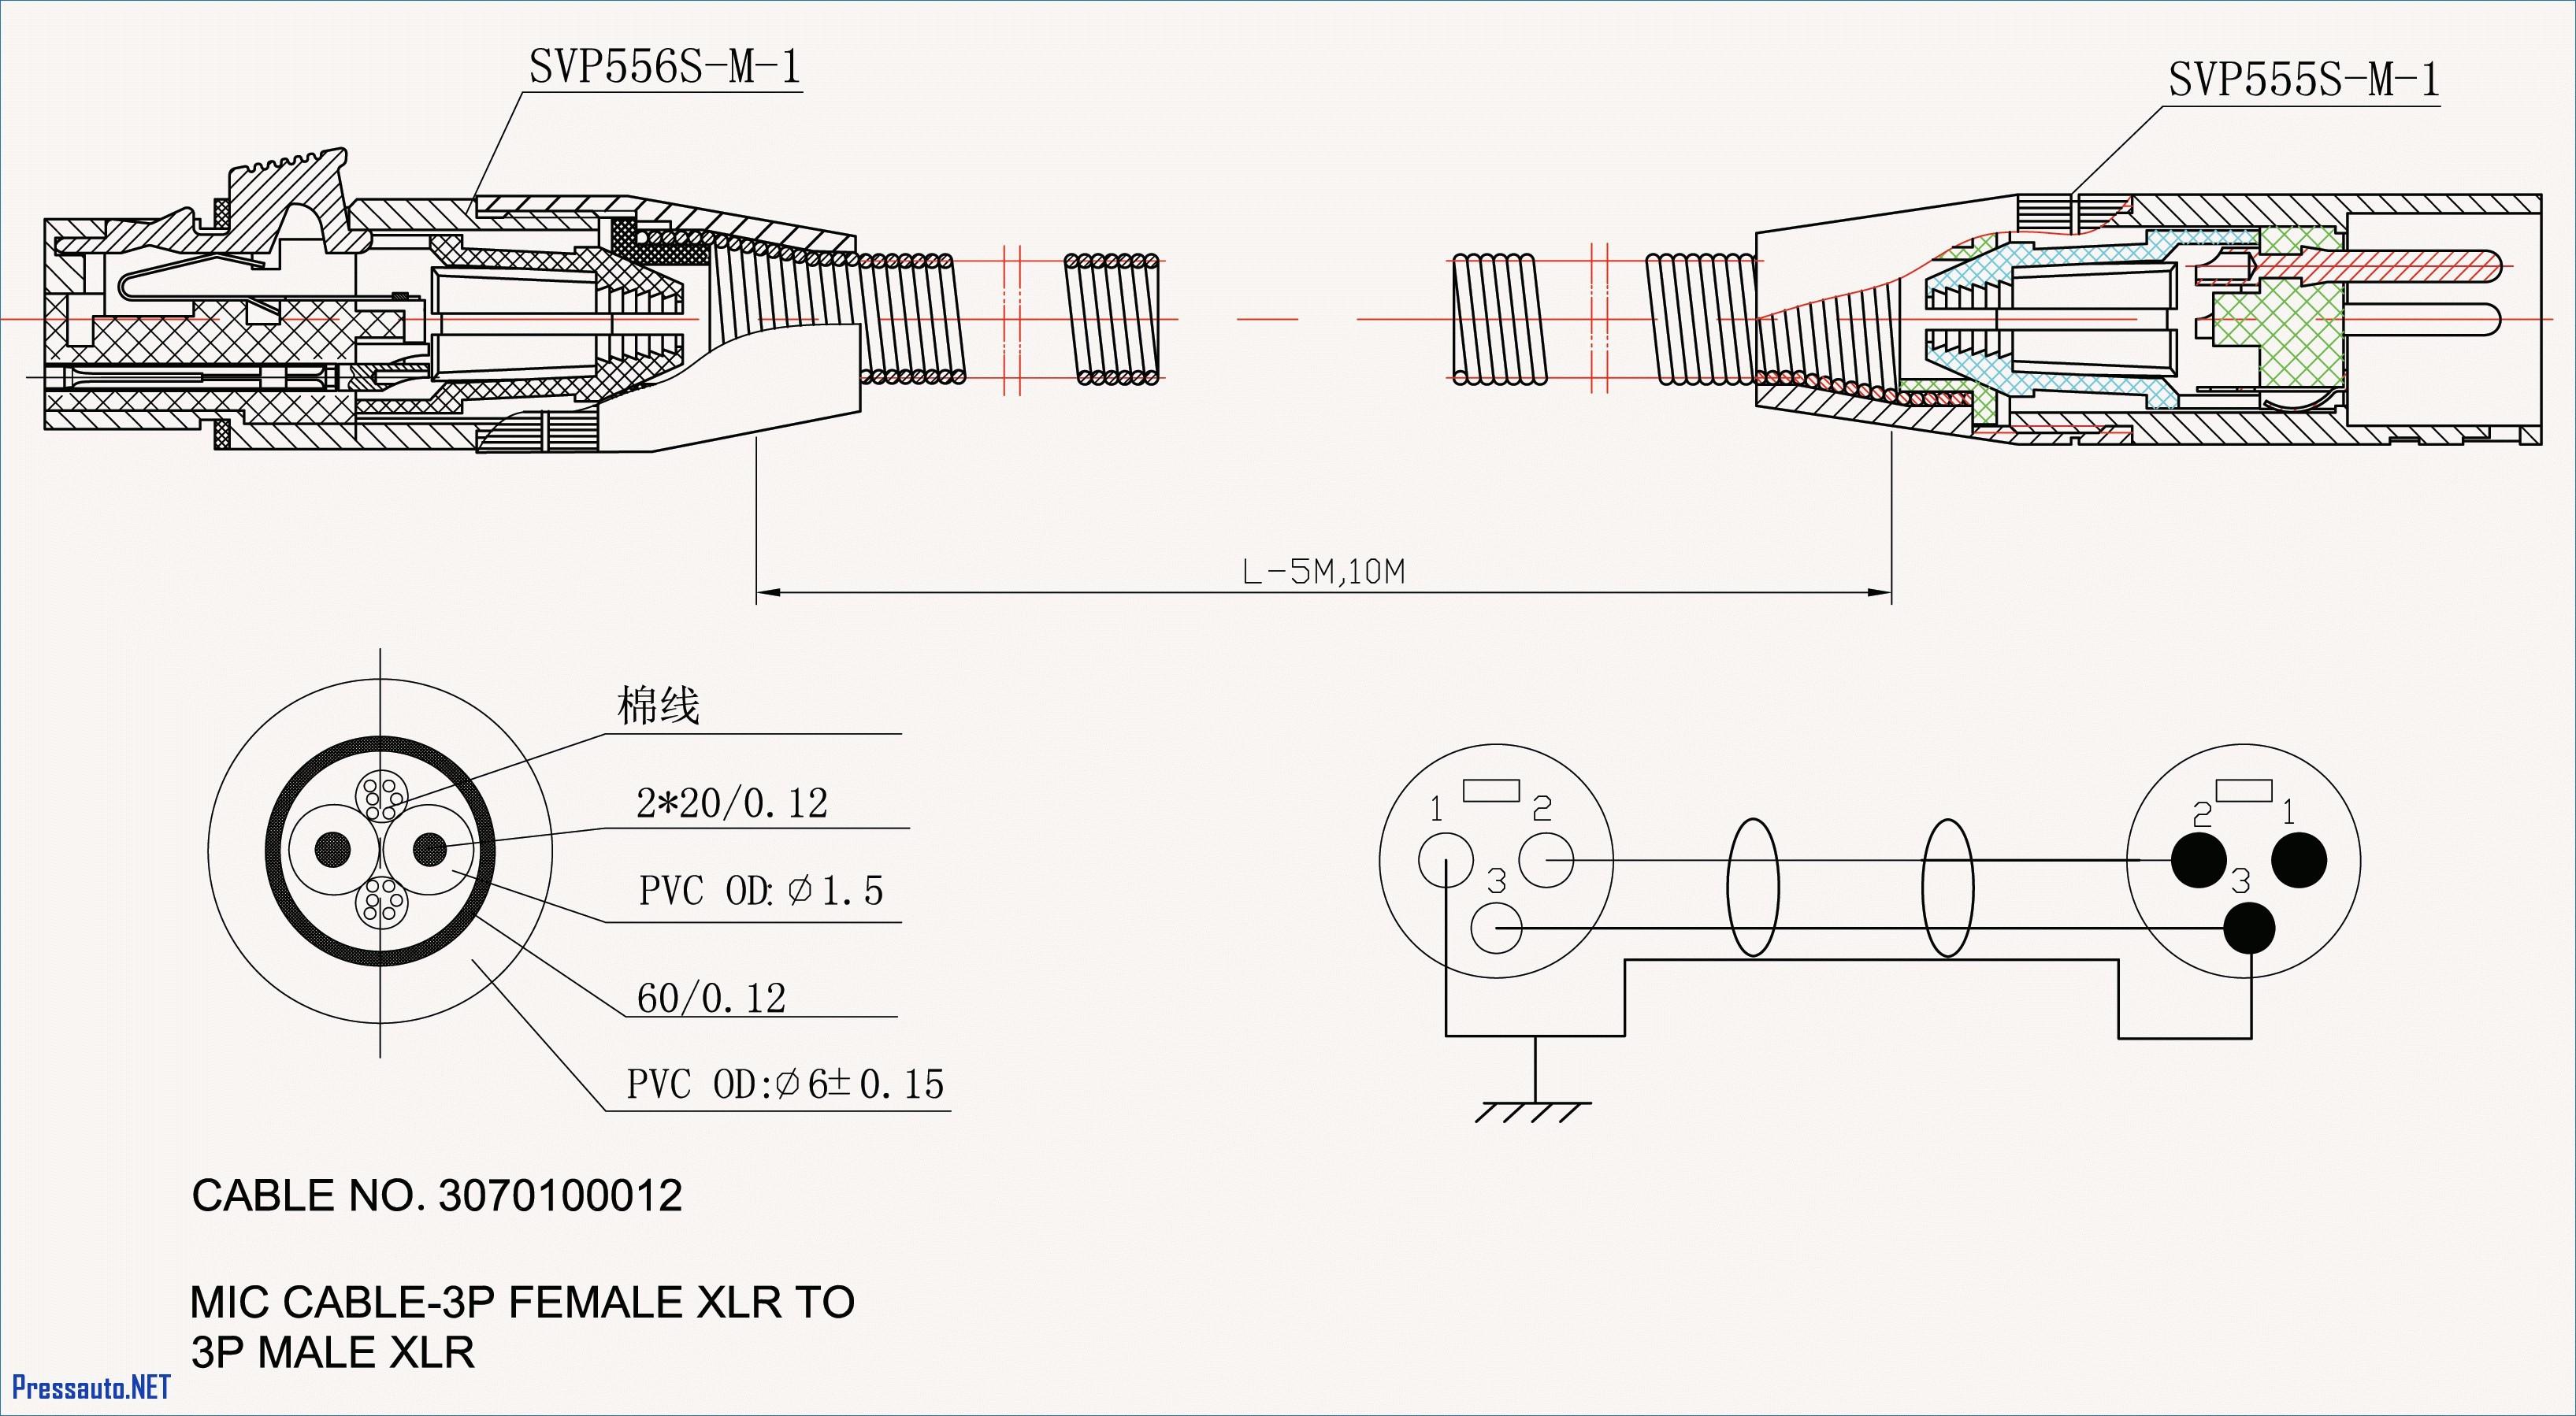 Massey Ferguson 135 Wiring Diagram With Alternator Save Xlr